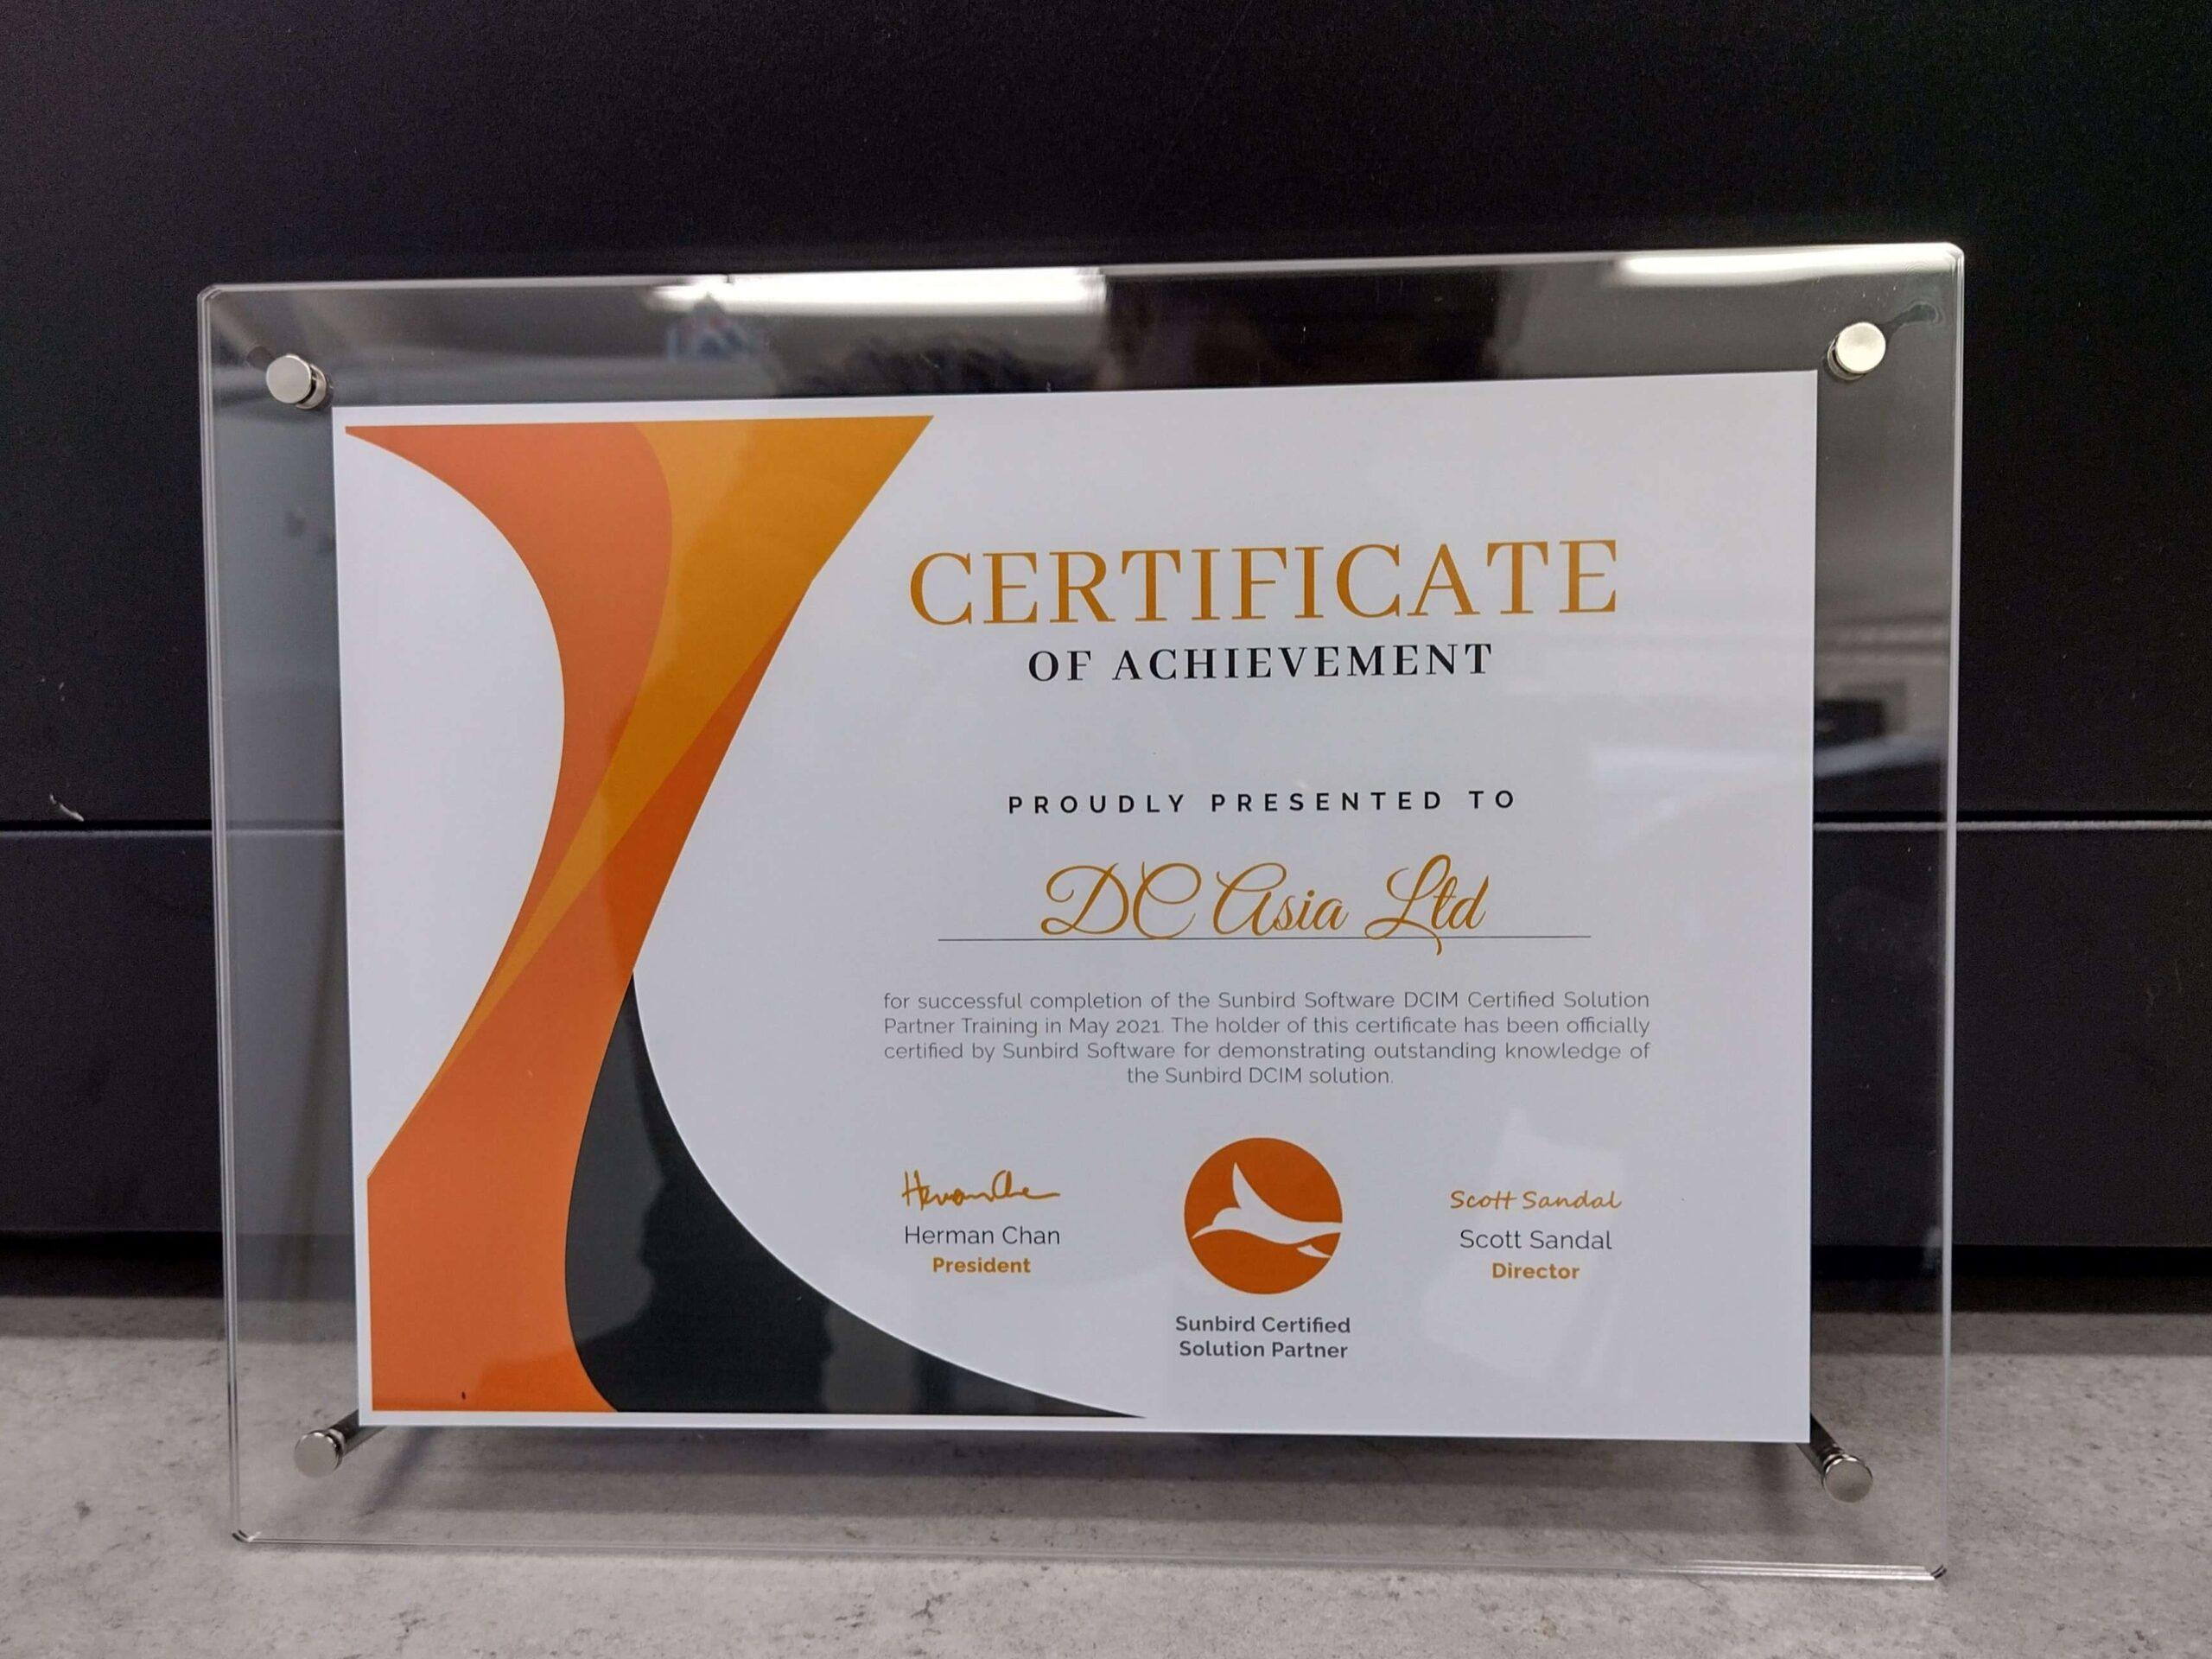 Sunbird Software DCIM Certified Solution Partner